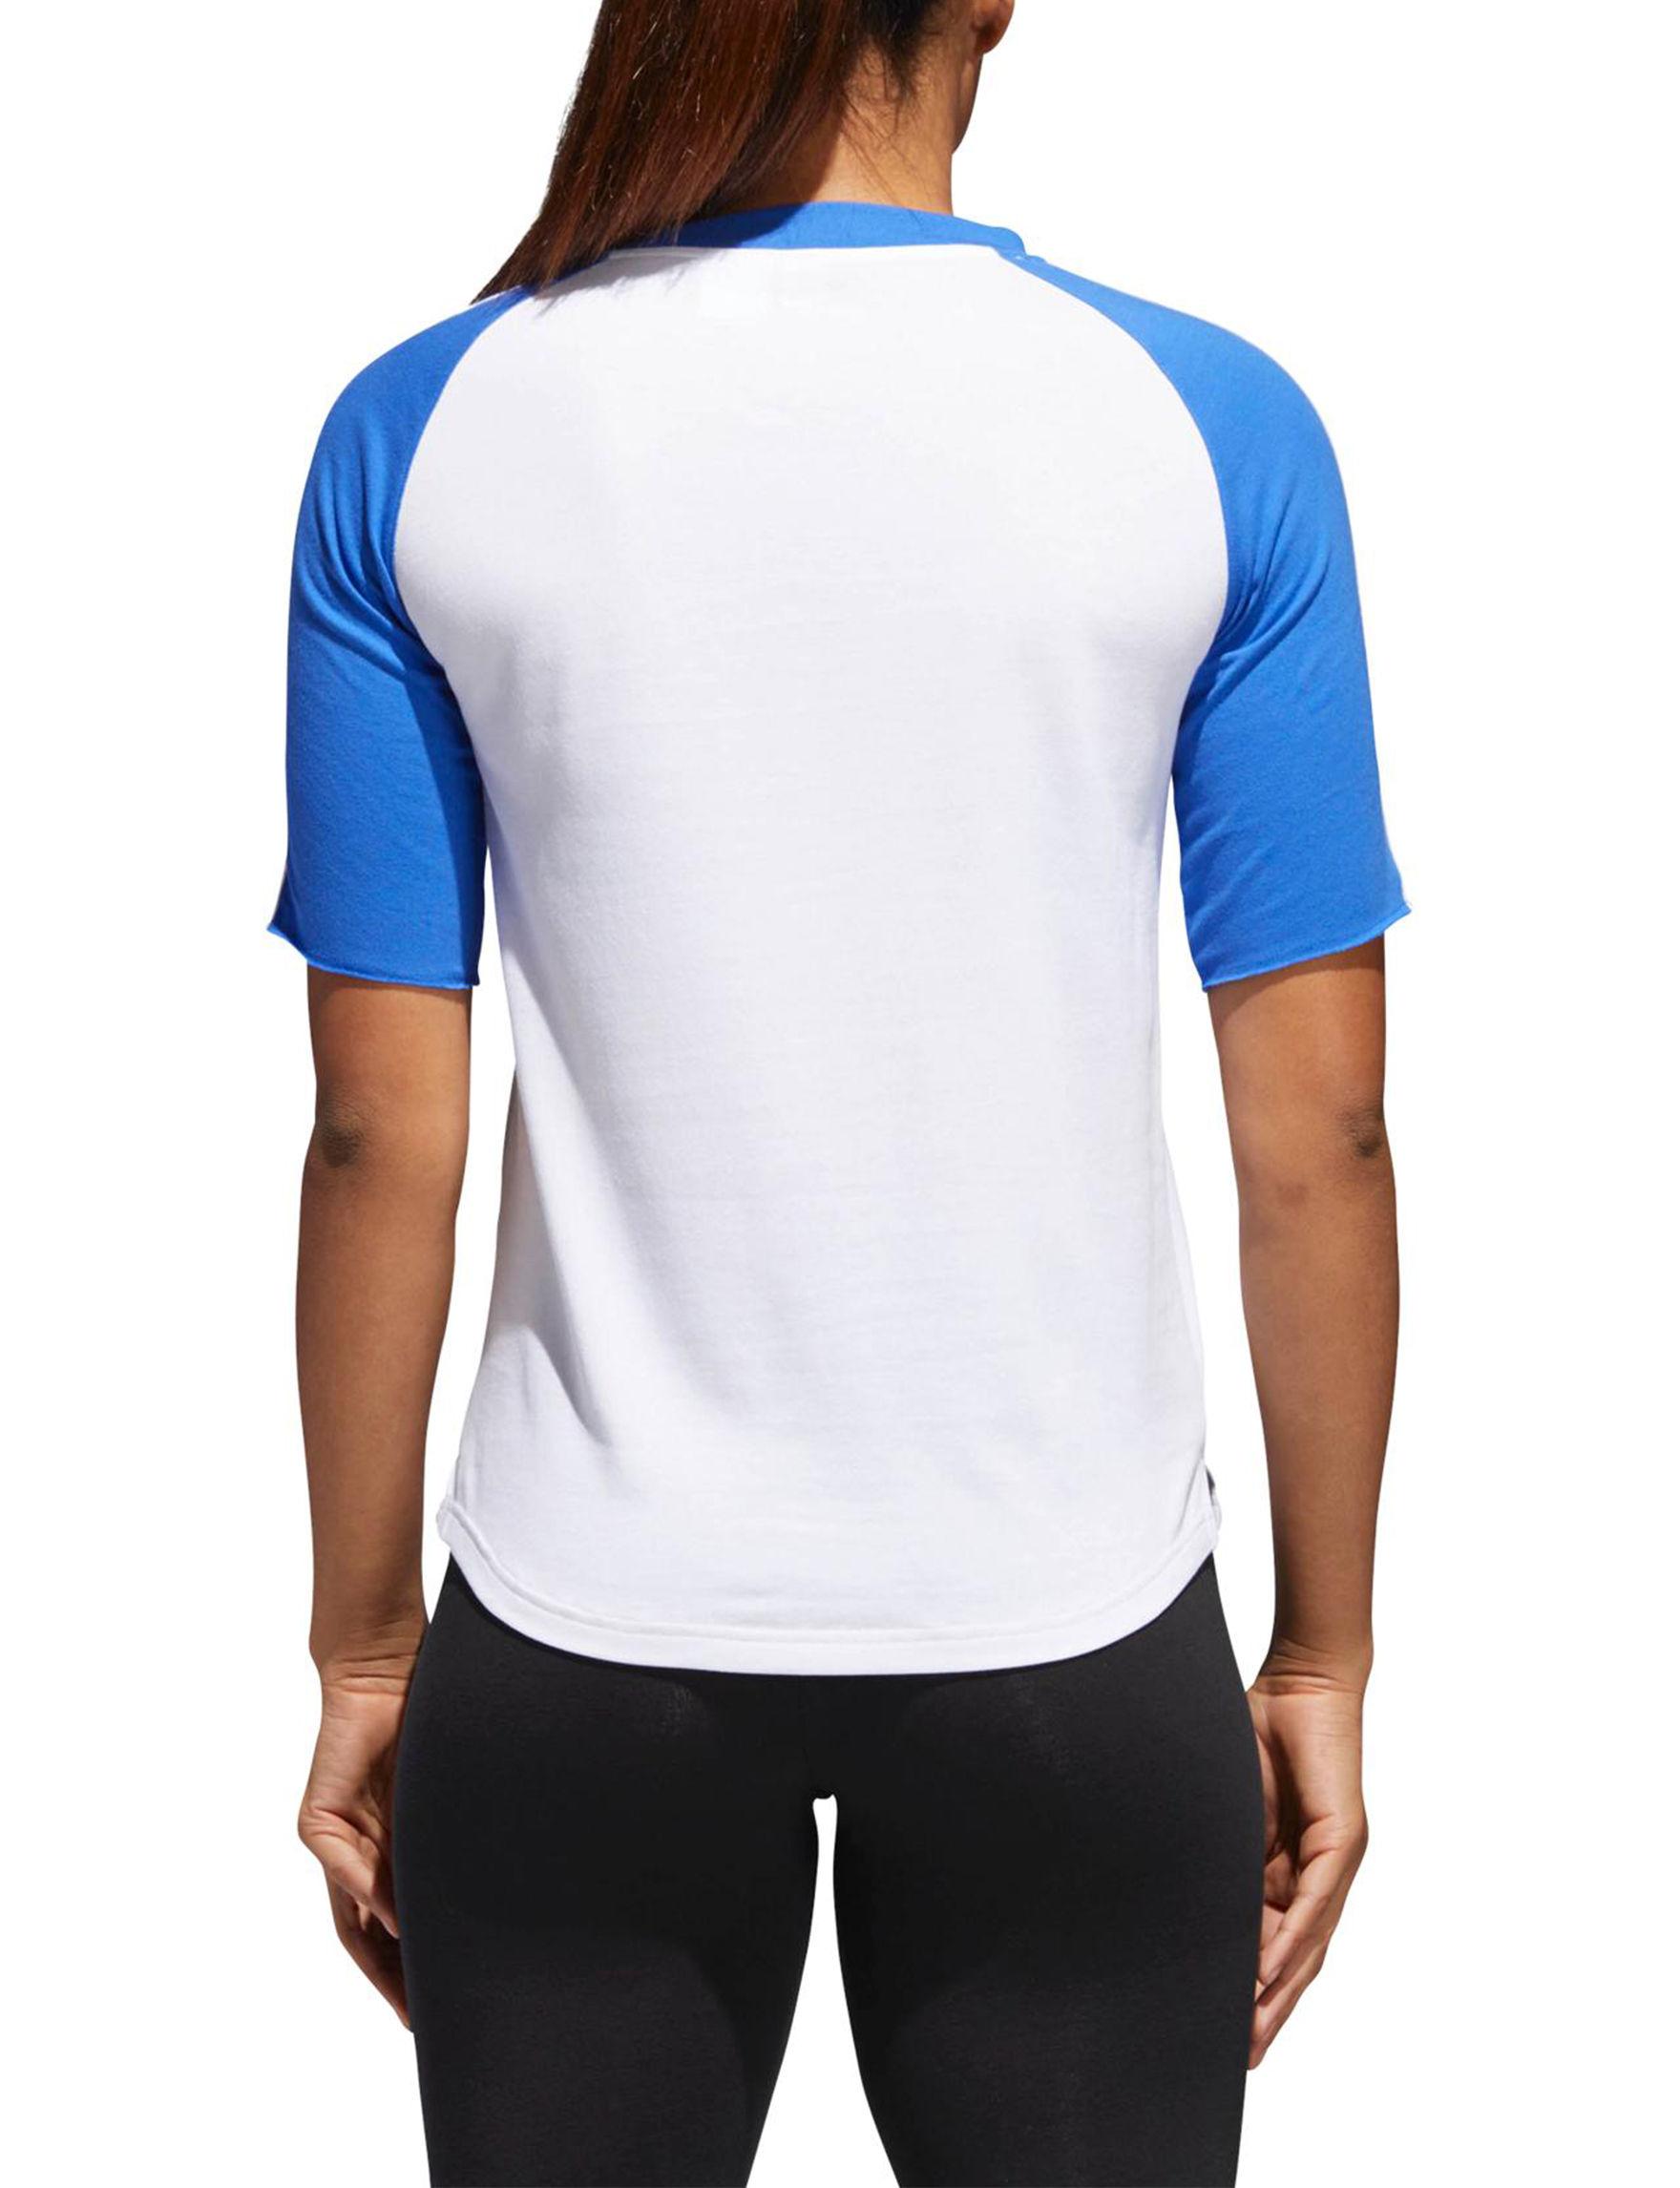 Adidas White / Blue Tees & Tanks